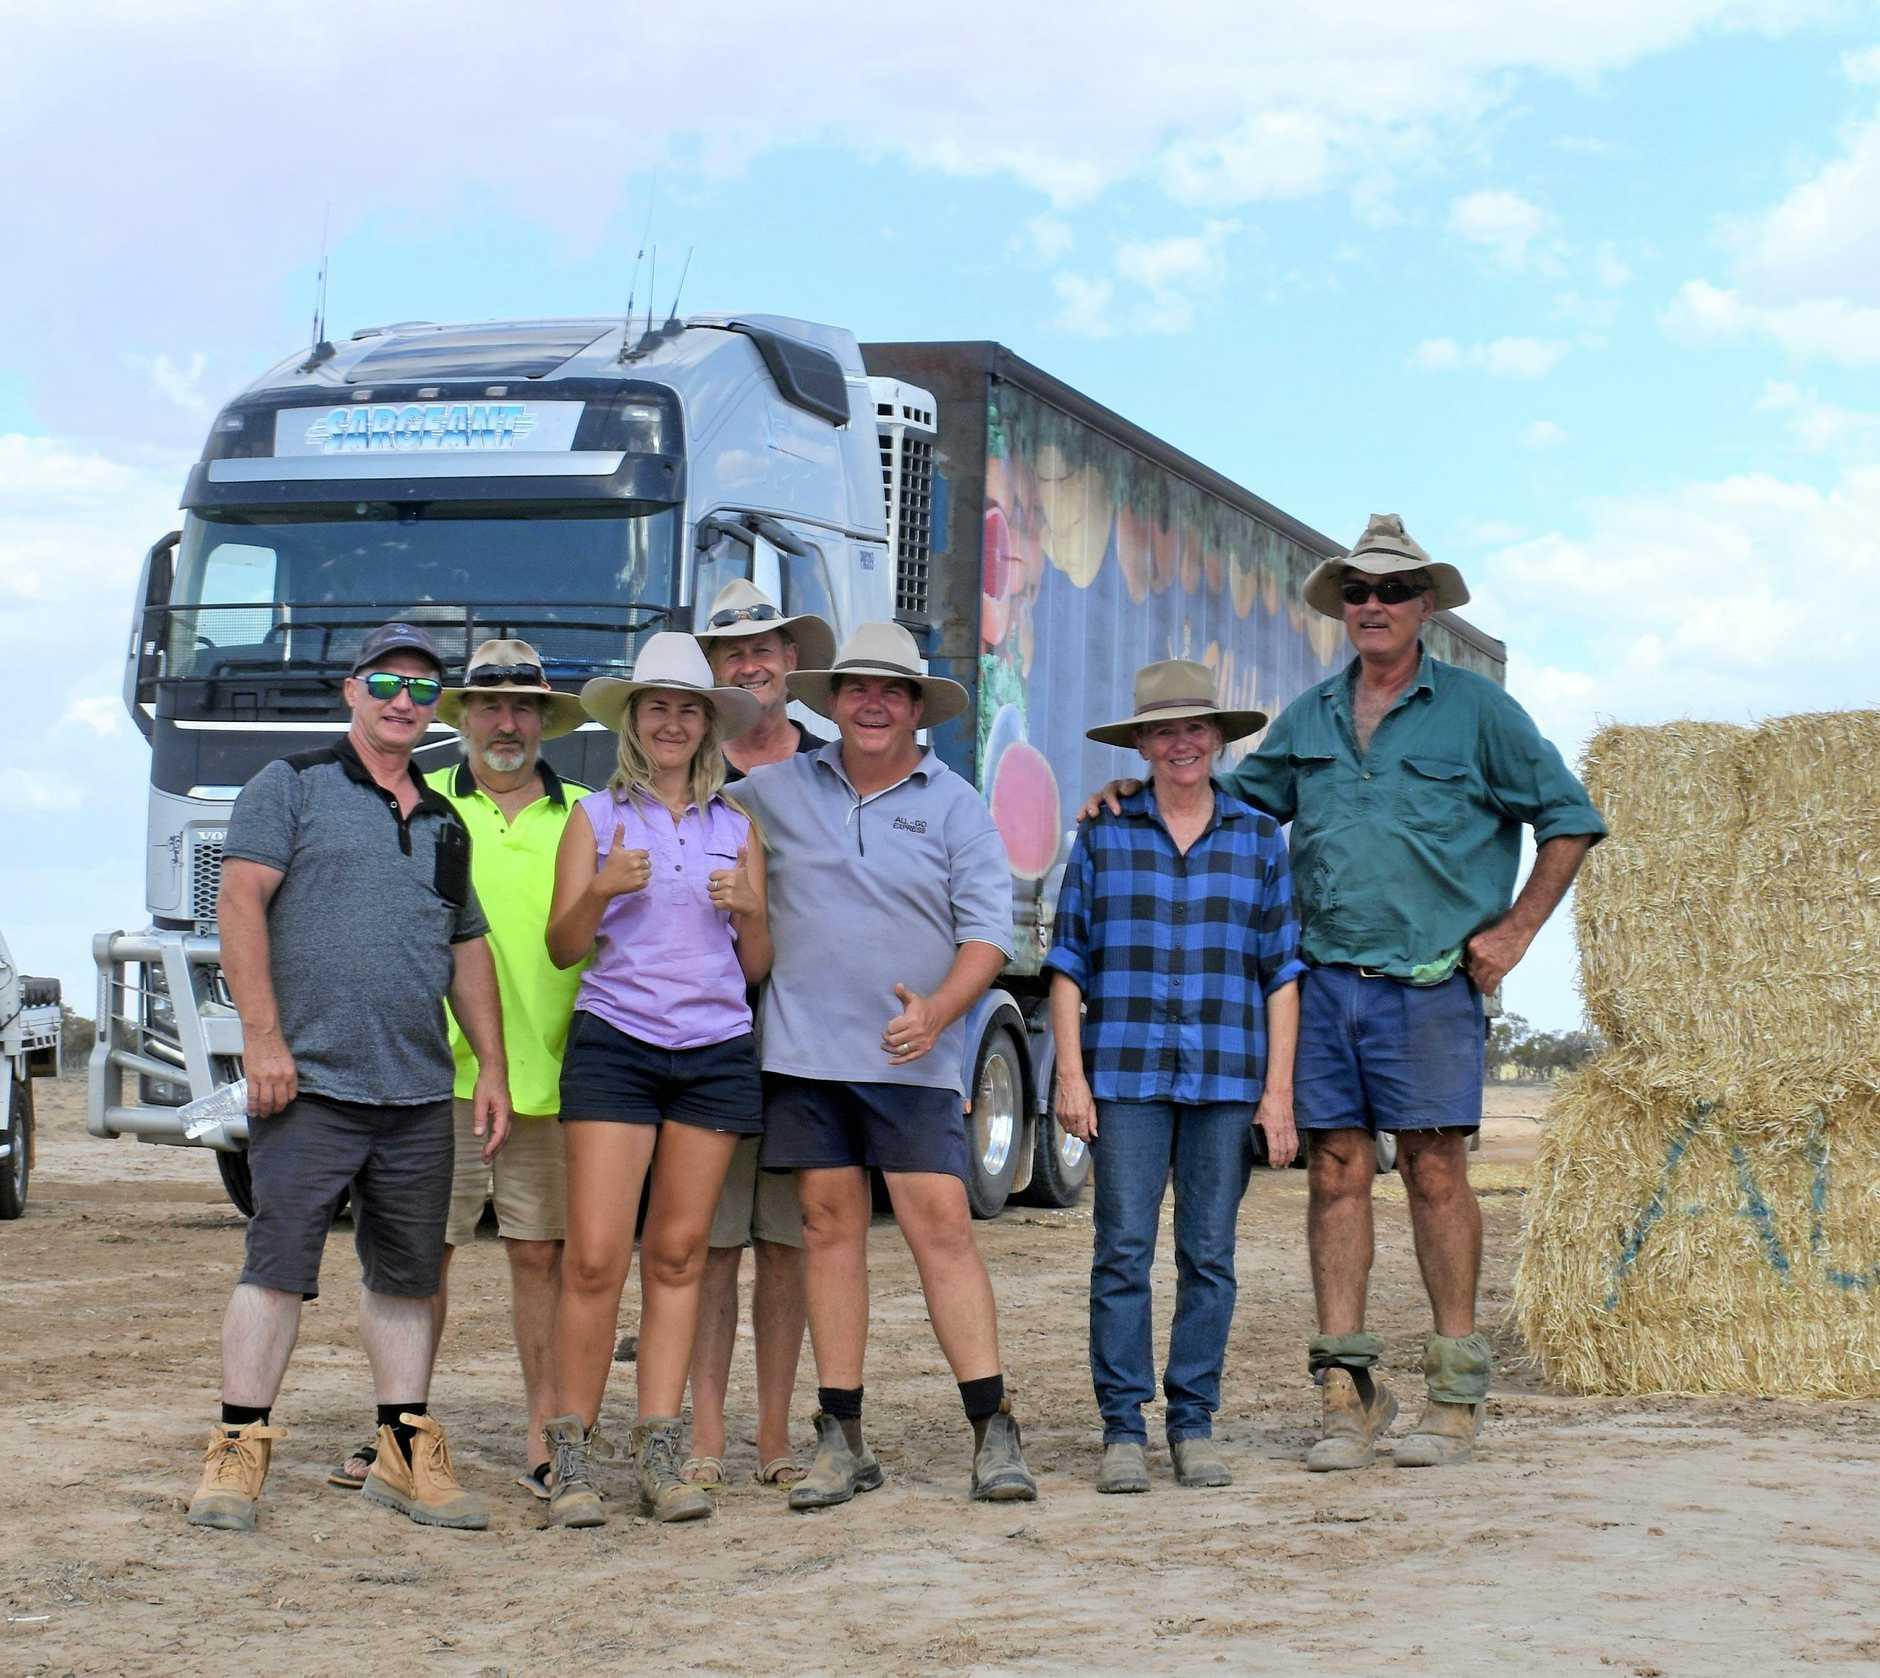 Lifelong bonds were formed on the hay run.